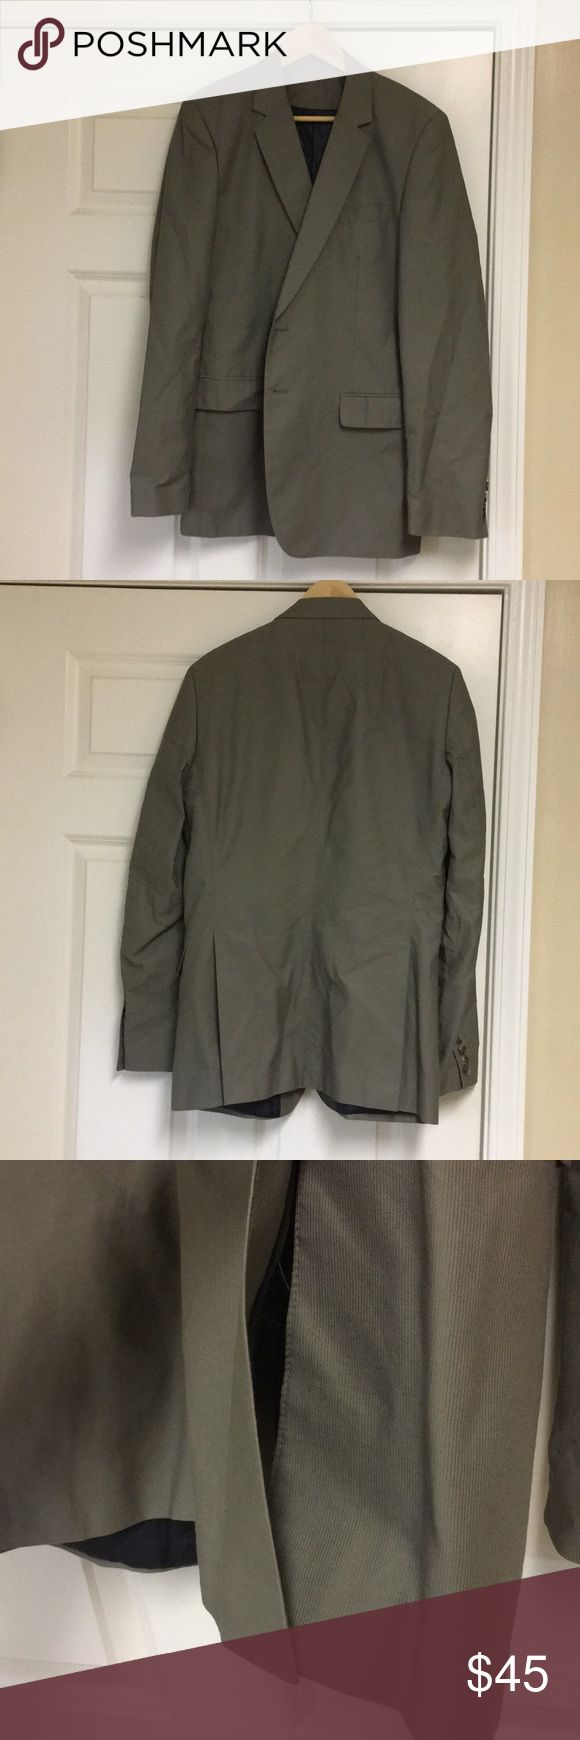 "⚡️SALE⚡️Zara Man gray blazer Zara man blazer • gray • Sz 40 • double vent back • 2-button closure • 27"" sleeves • 17"" shoulders • 20"" armpit to armpit • excellent condition • fast same/next day shipping • BUNDLE &?BUY IT NOW!!! Zara Jackets & Coats"